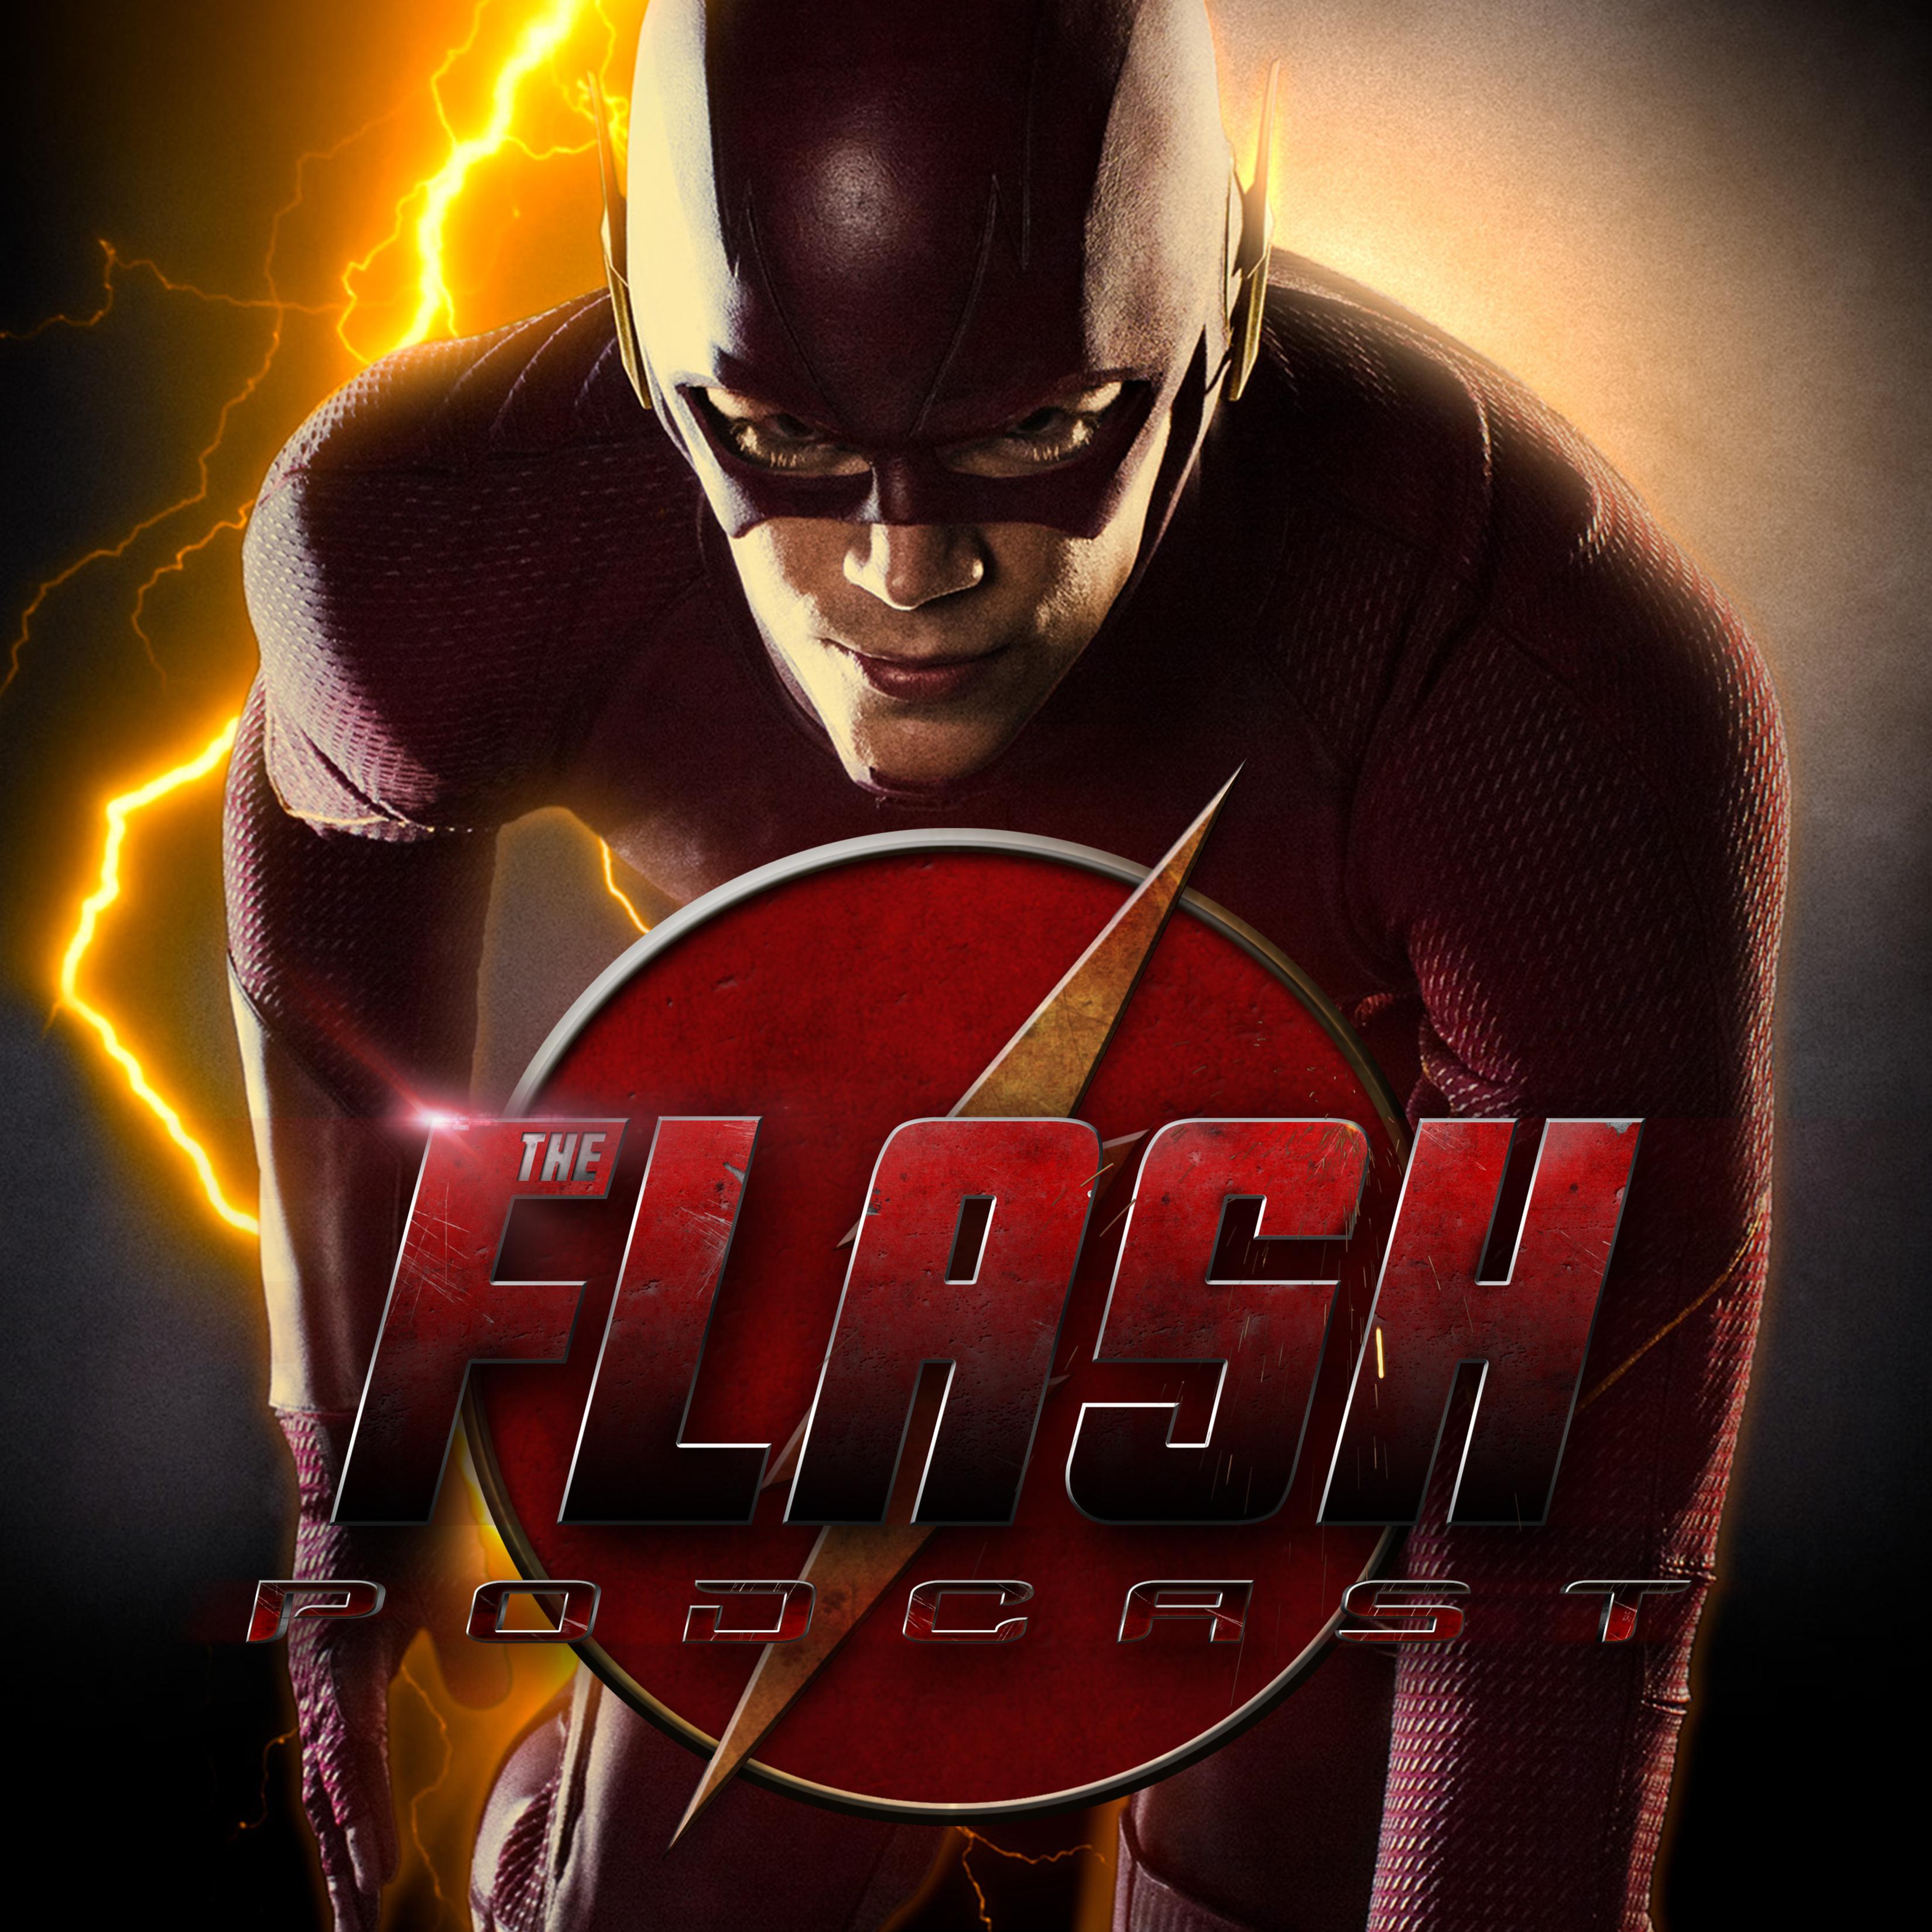 The Flash Podcast 05 - Plastique